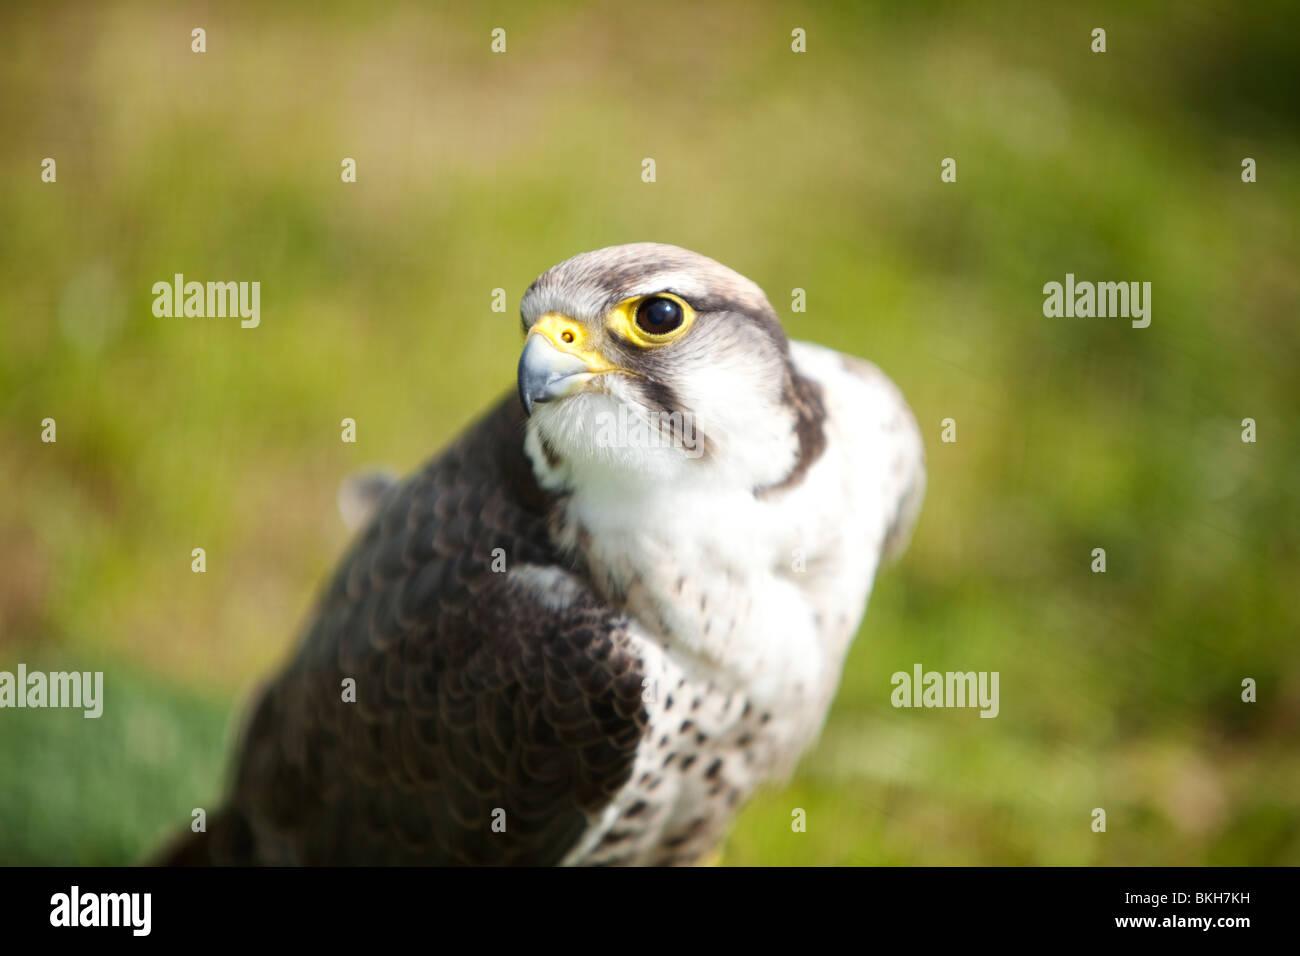 Falcon Stockbild